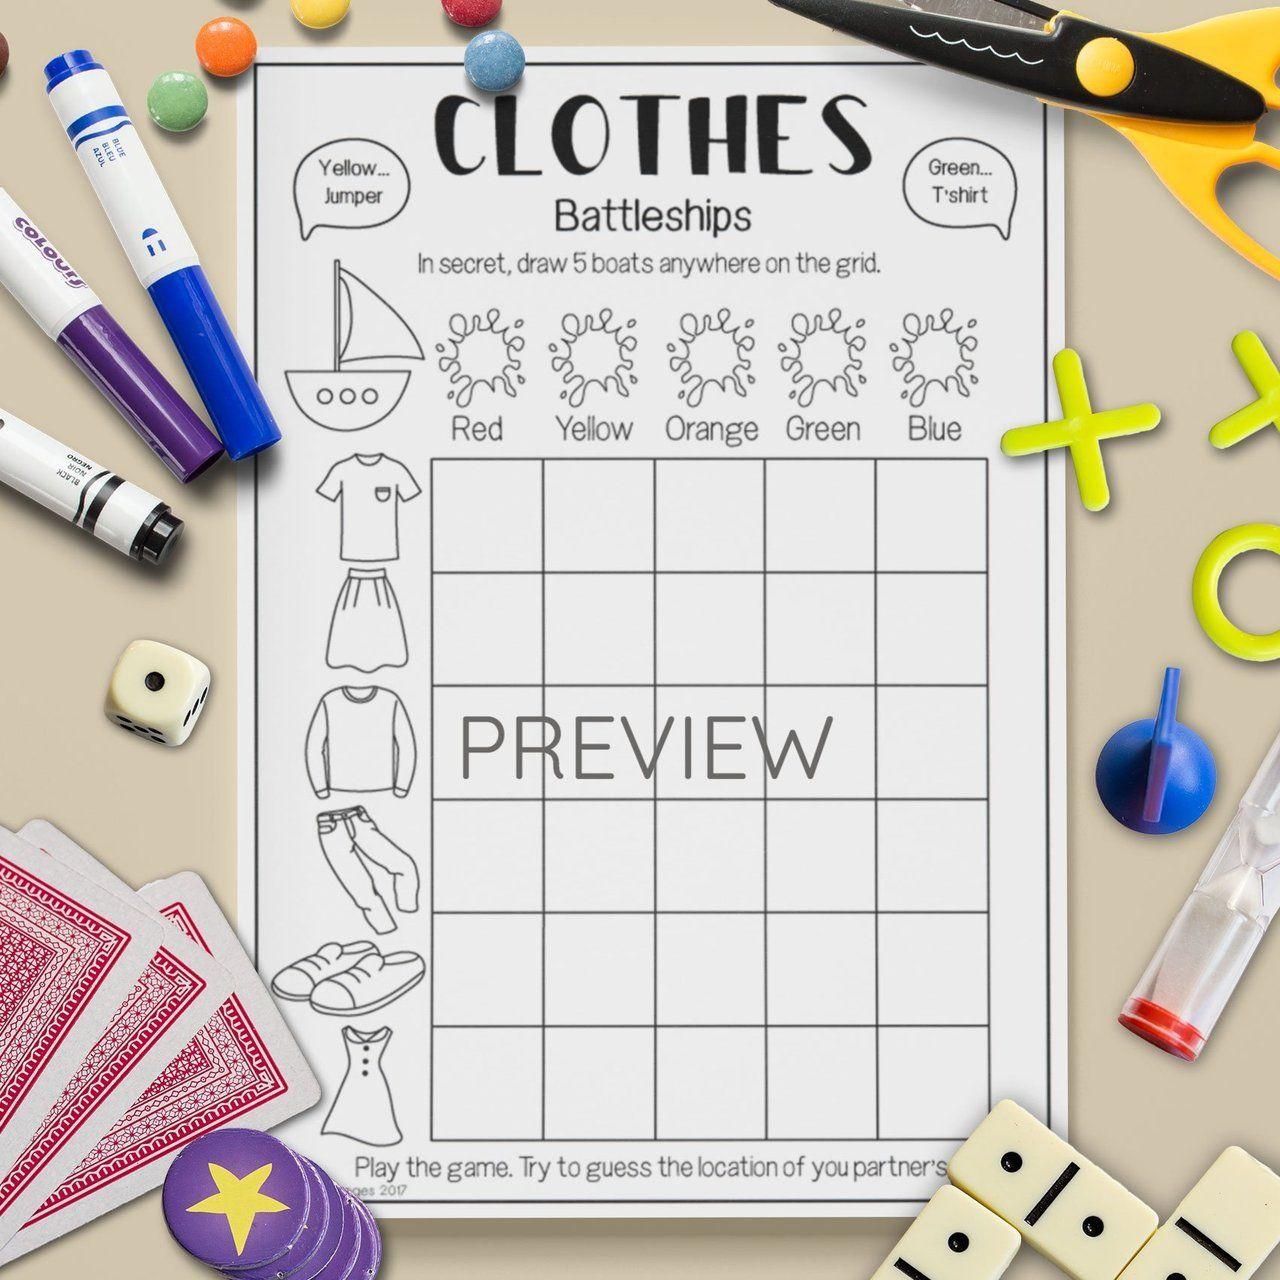 Clothes Battleships Game